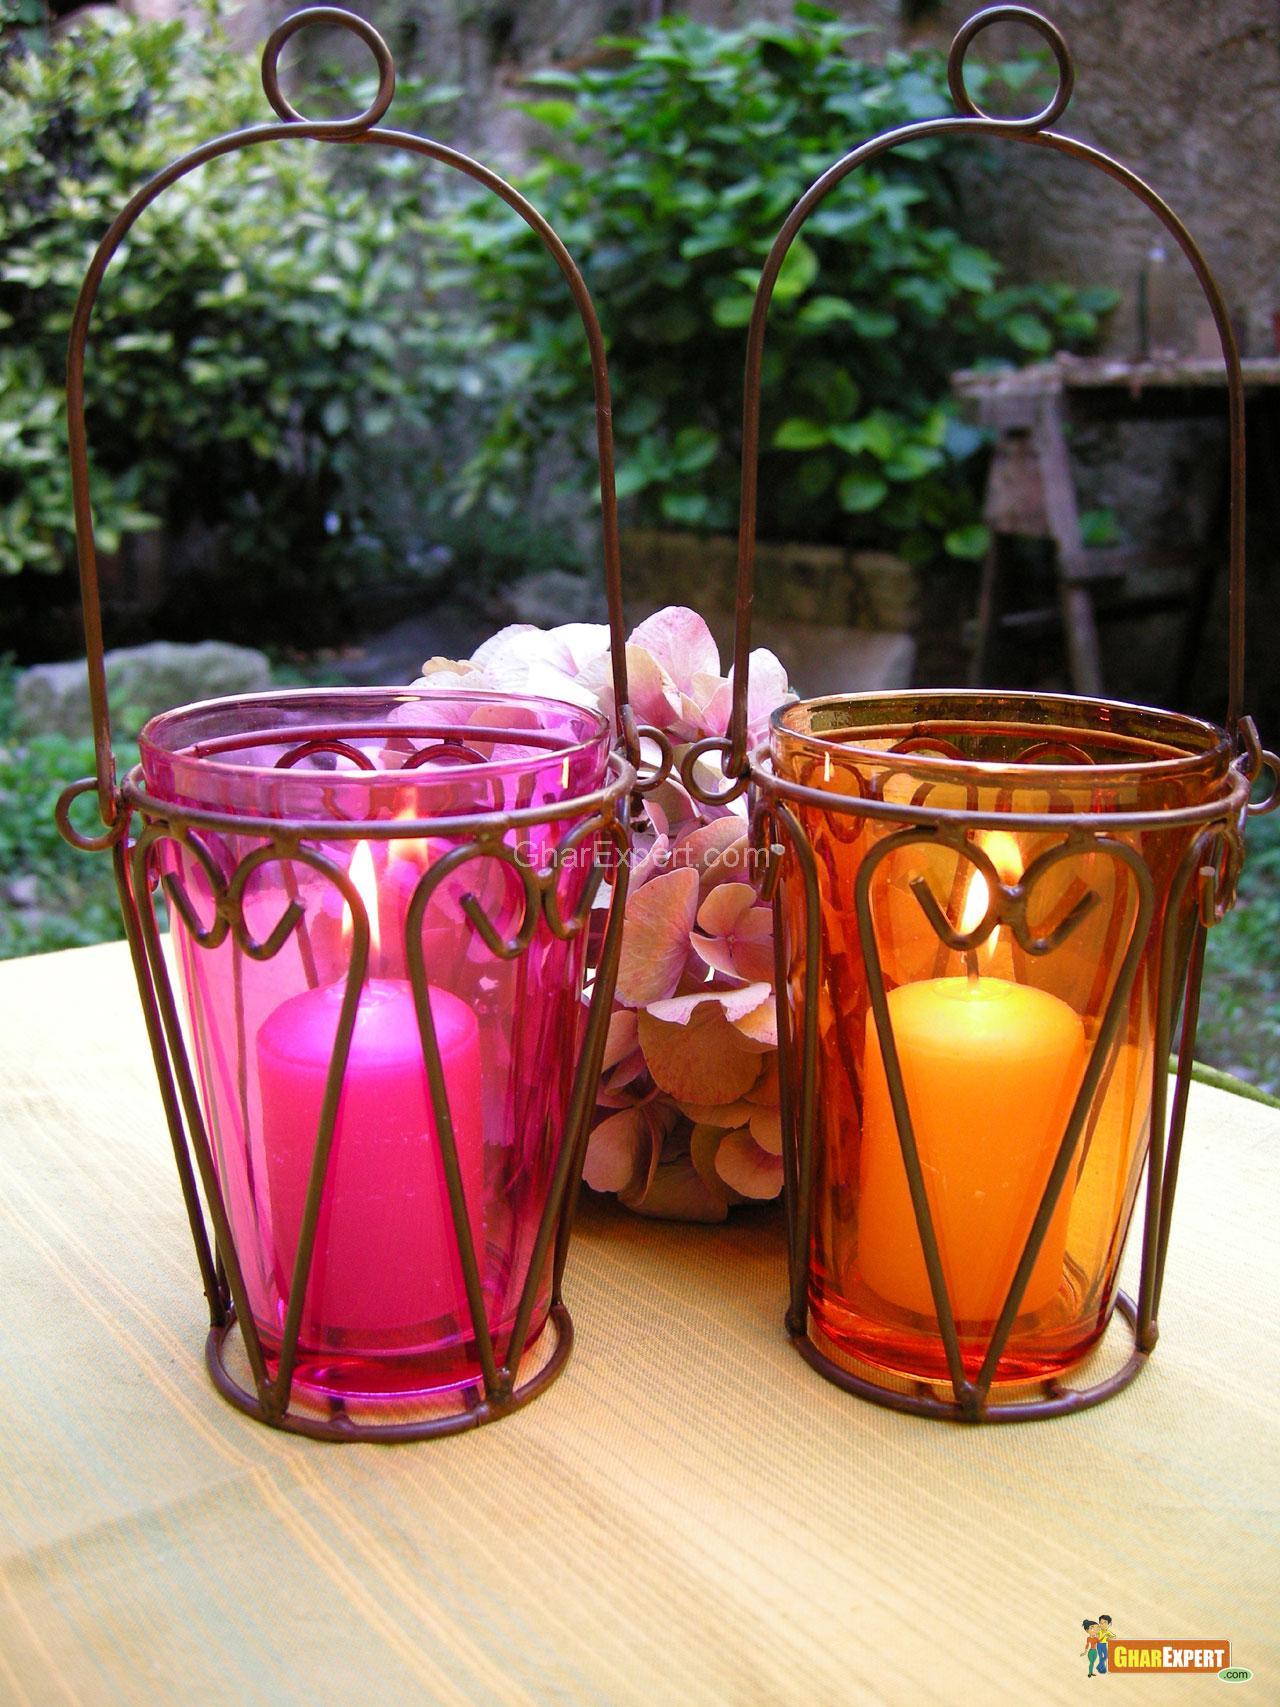 Colorful Glass Lanterns in Gar....